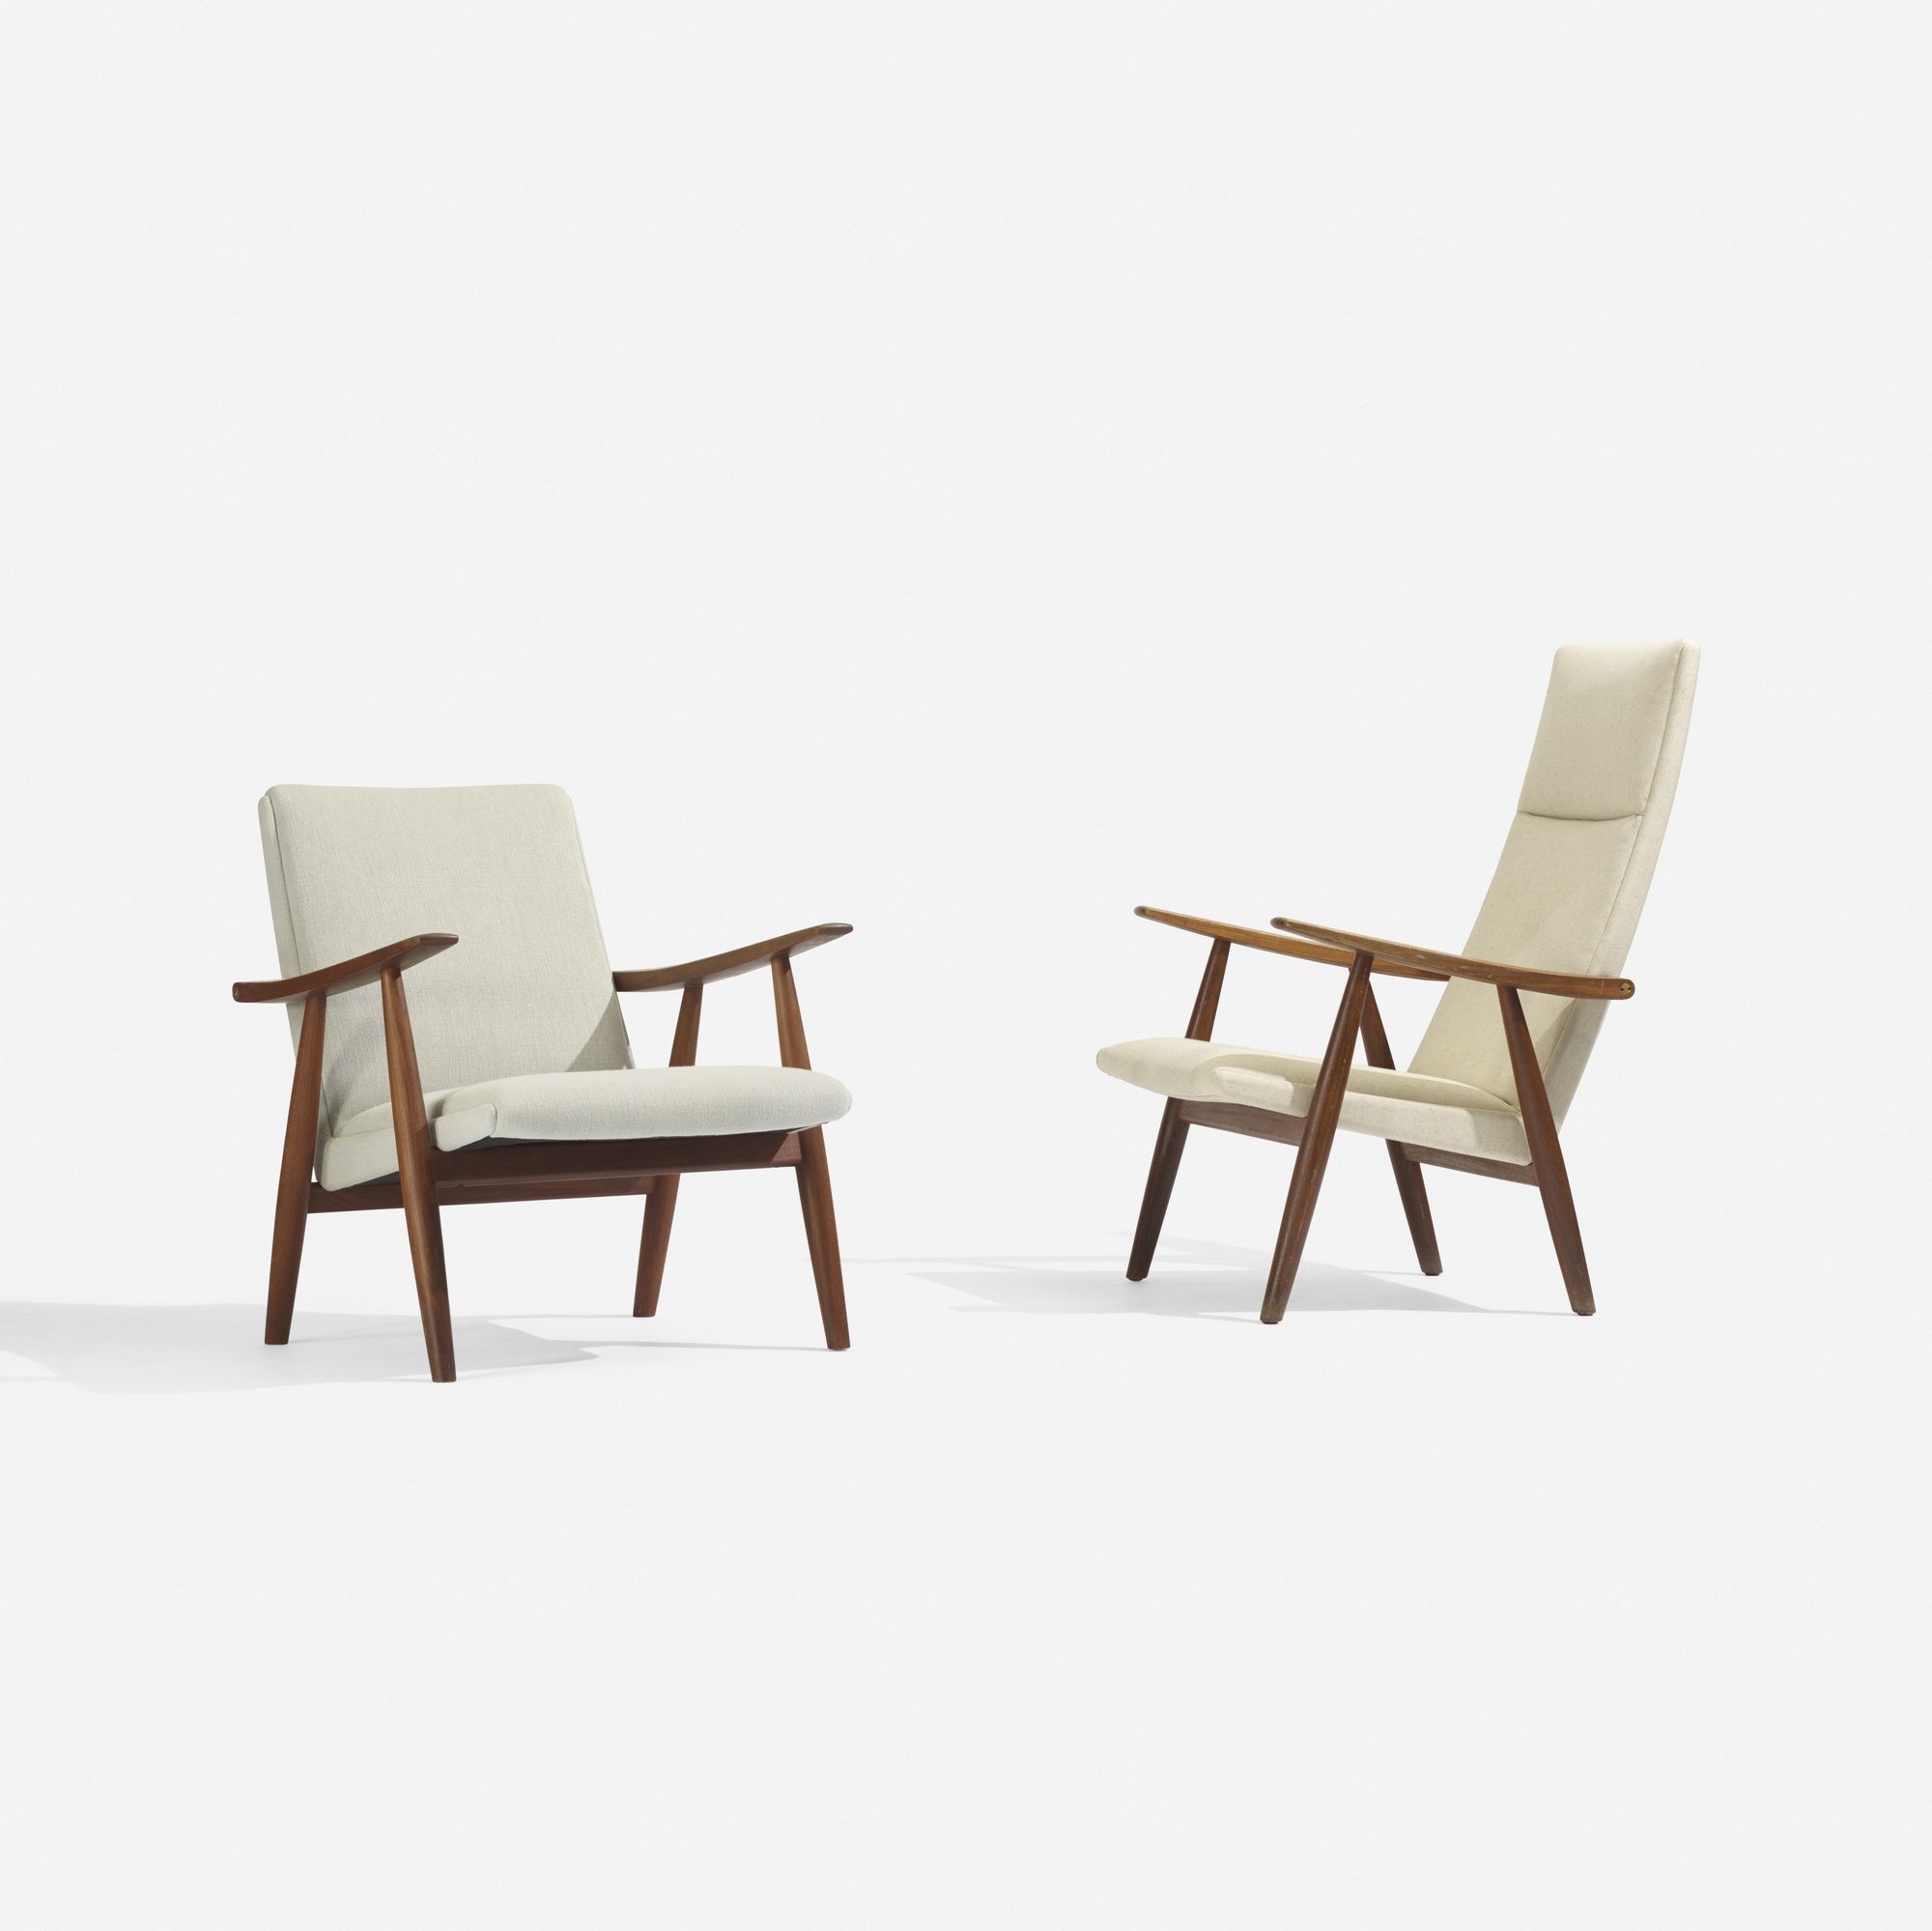 264 hans j wegner lounge chair model ge260 and lounge chair